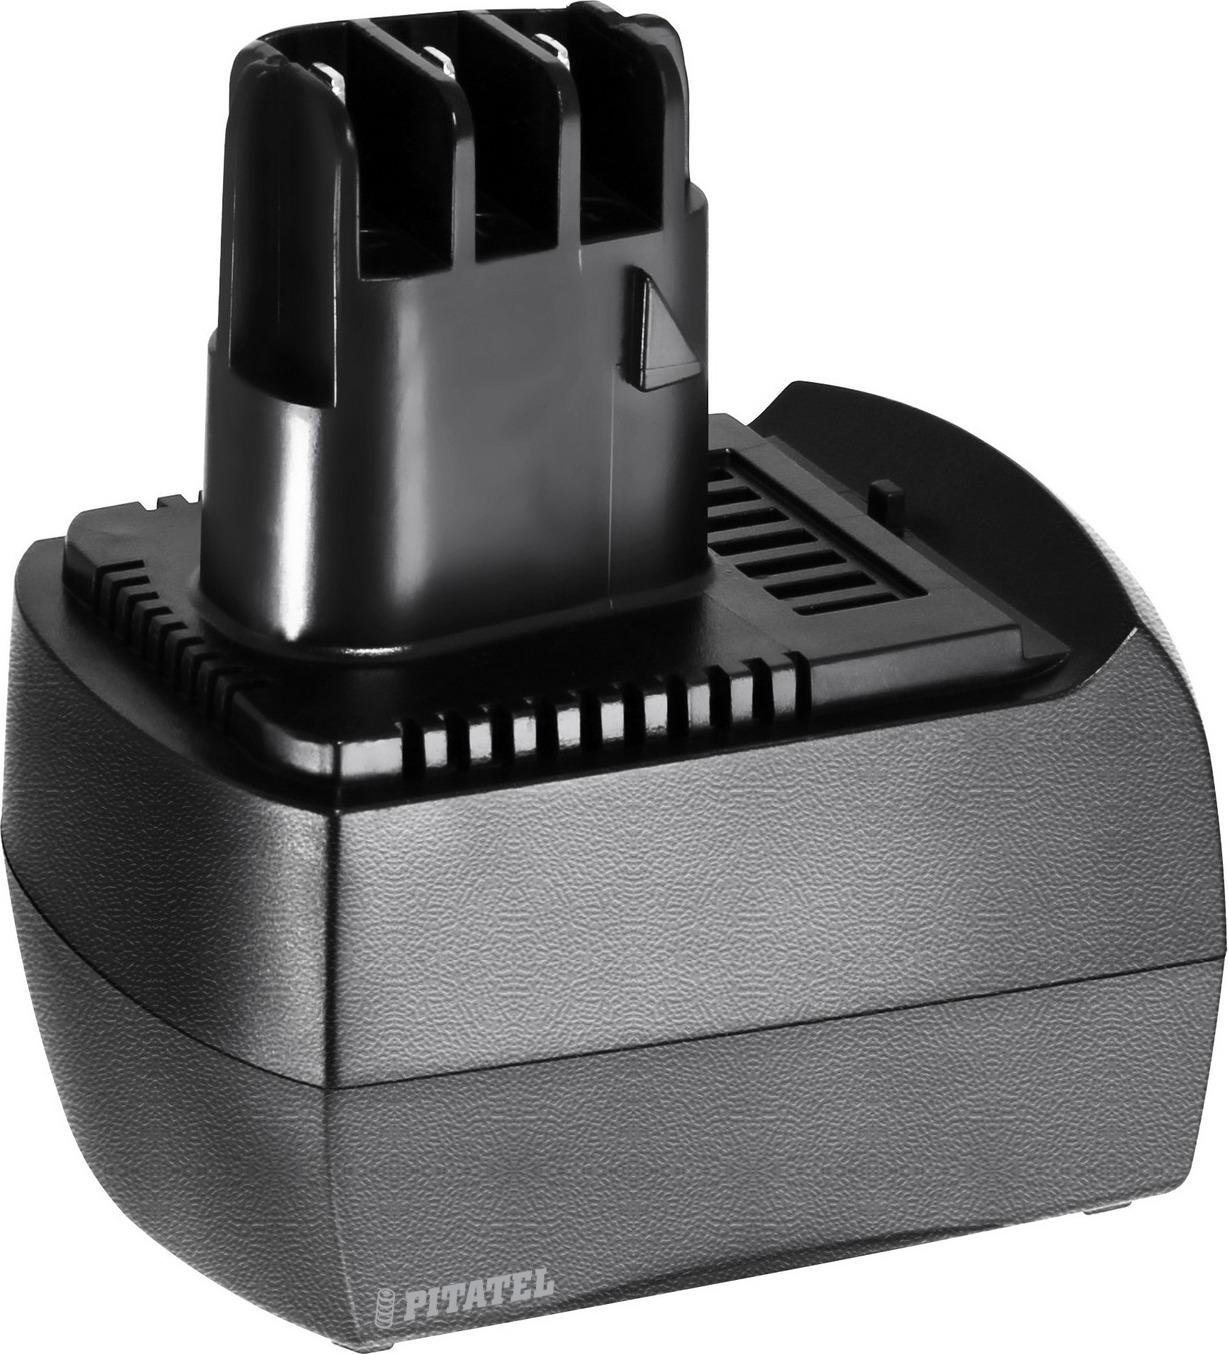 Фото - Аккумулятор для инструмента Pitatel TSB-103-MET12A-20C для METABO, черный аккумулятор